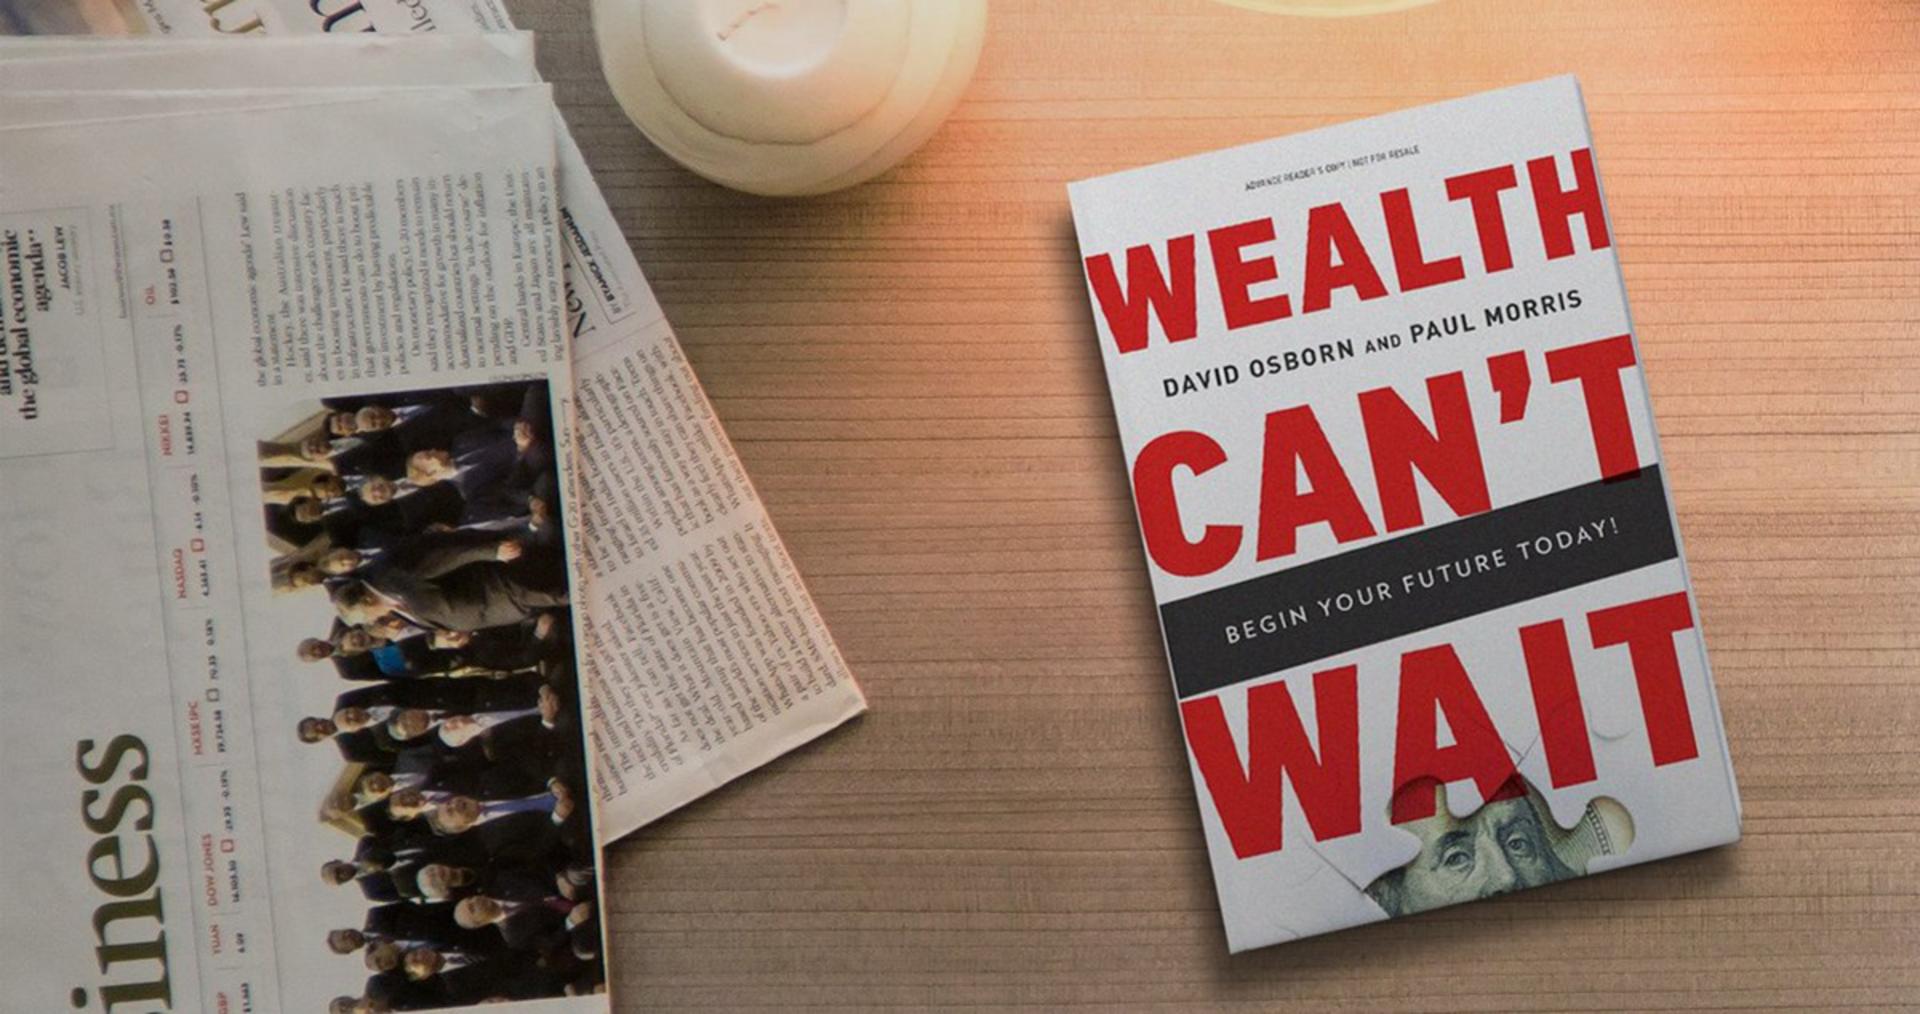 Wealth Can't Wait!